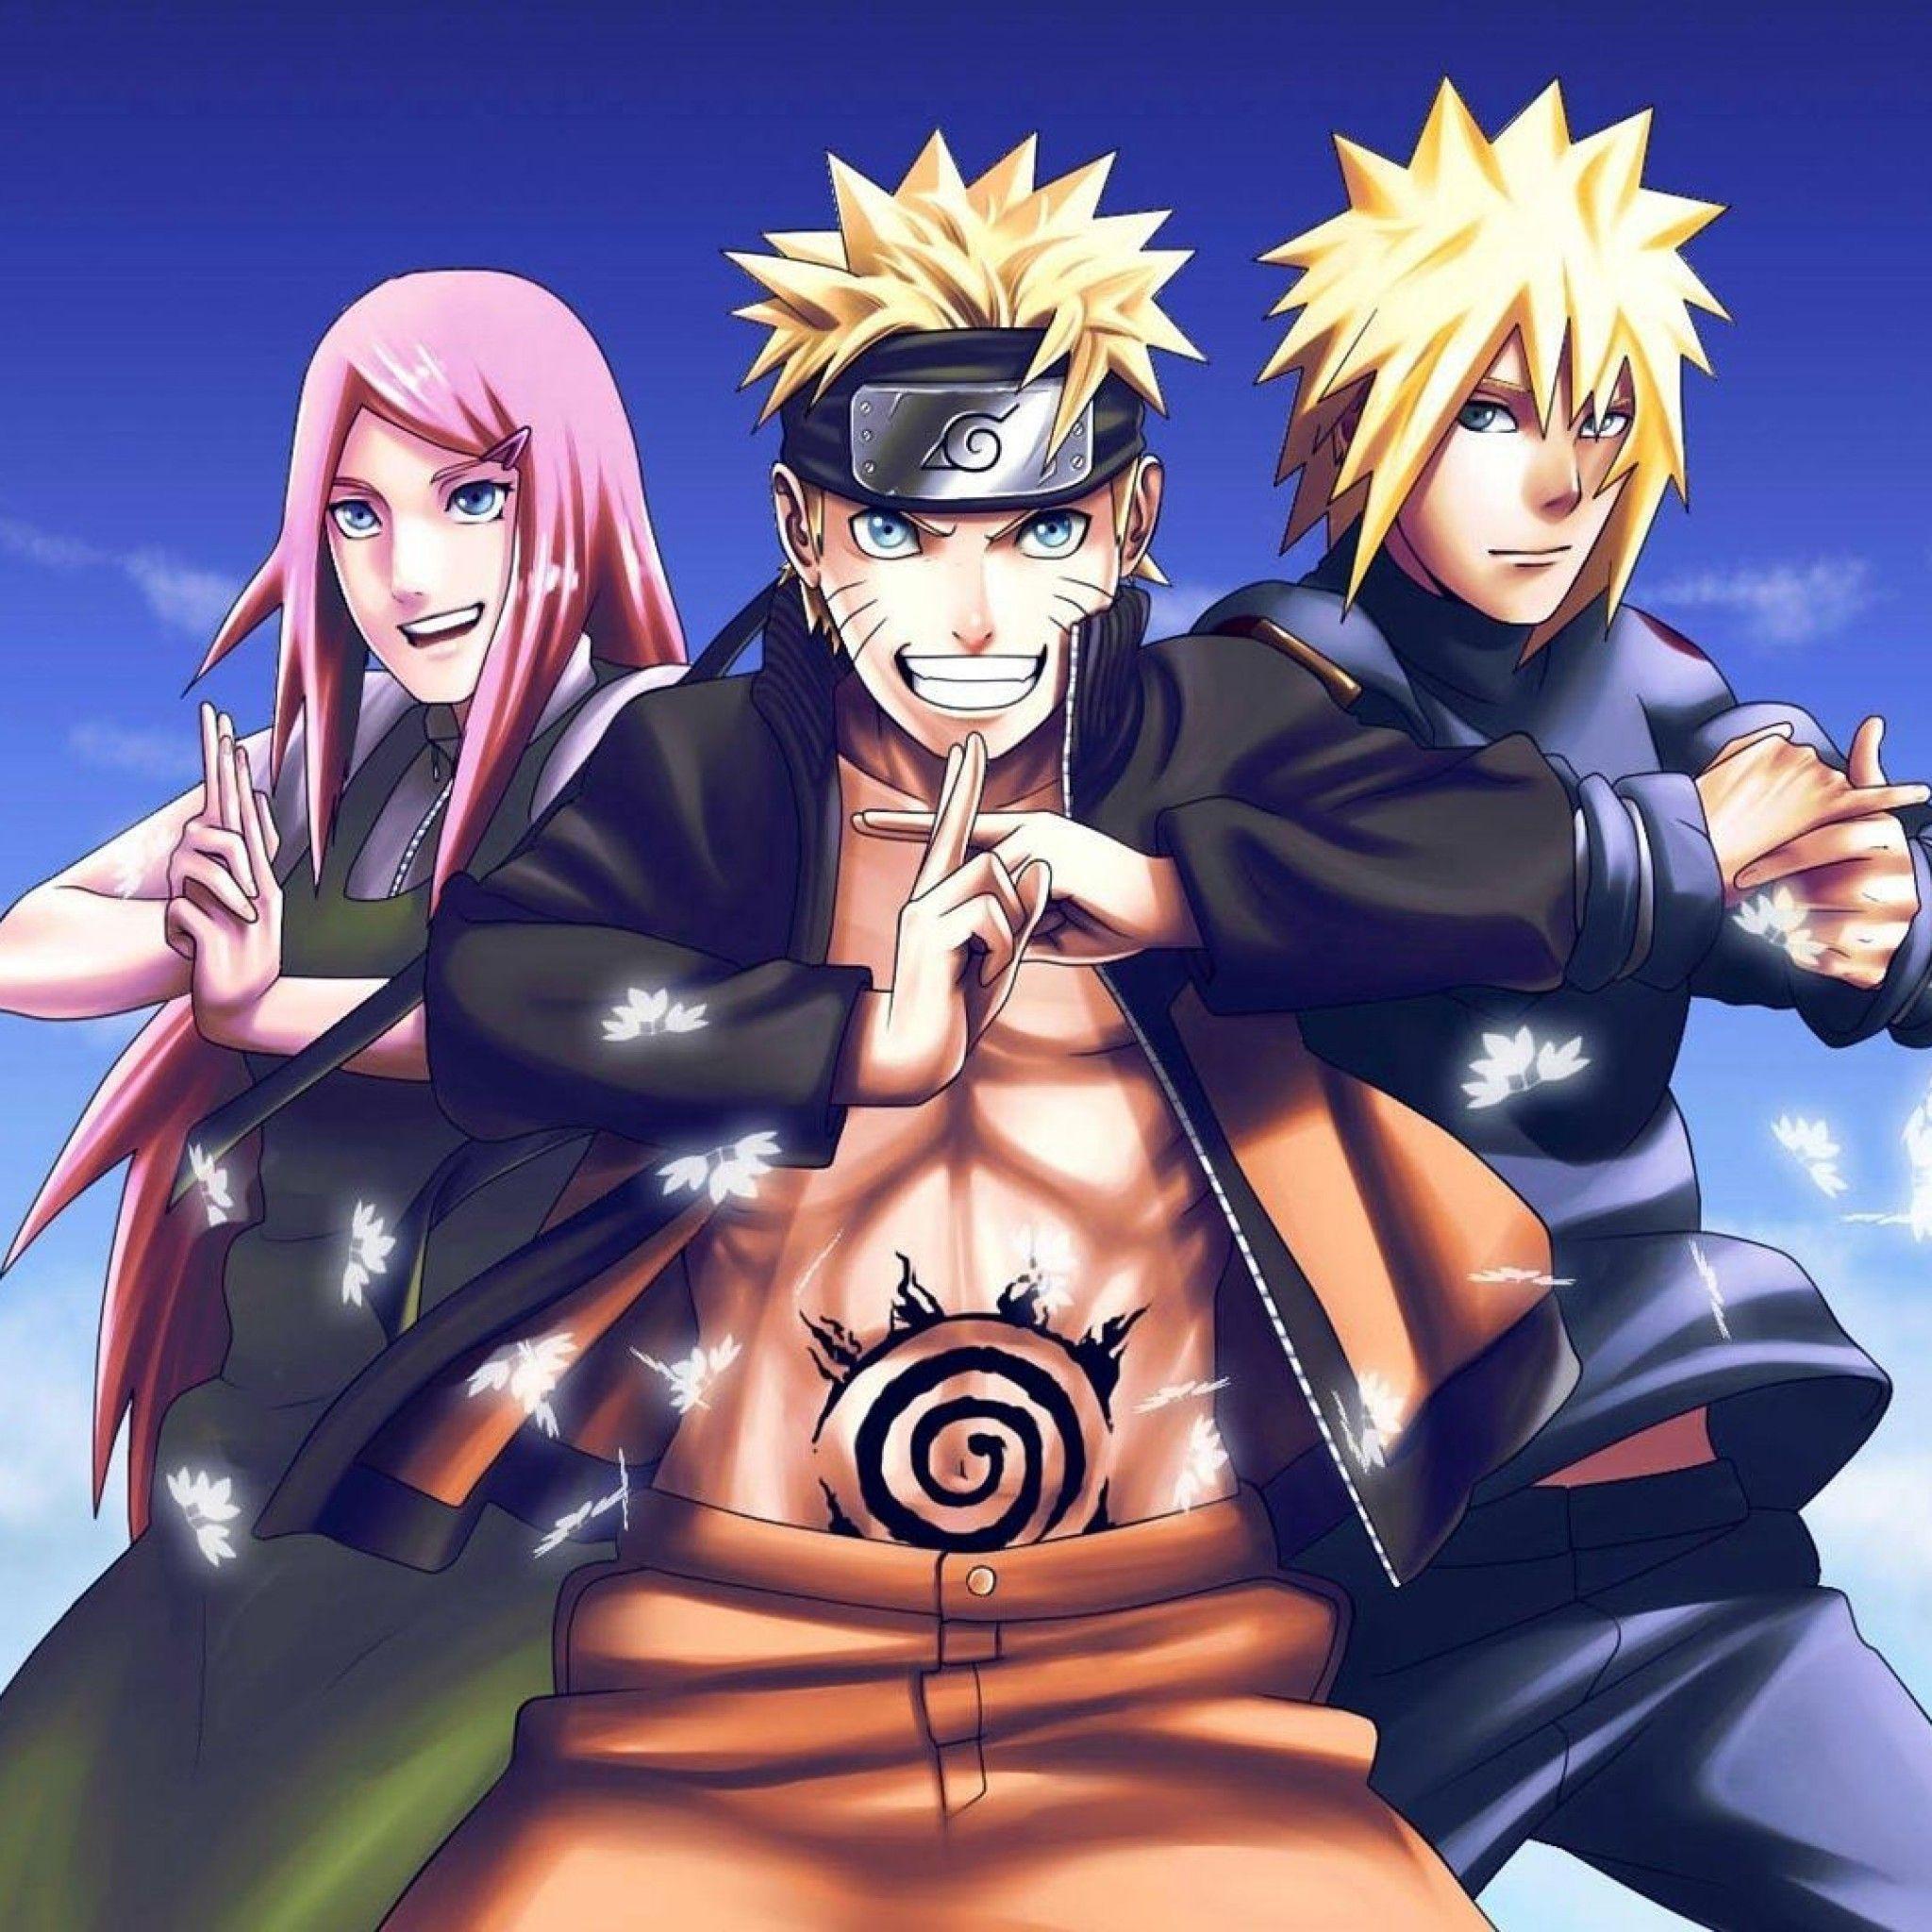 12 Anime Naruto Hd Fond D Ecran Android In 2020 Anime Anime Naruto Naruto Wallpaper